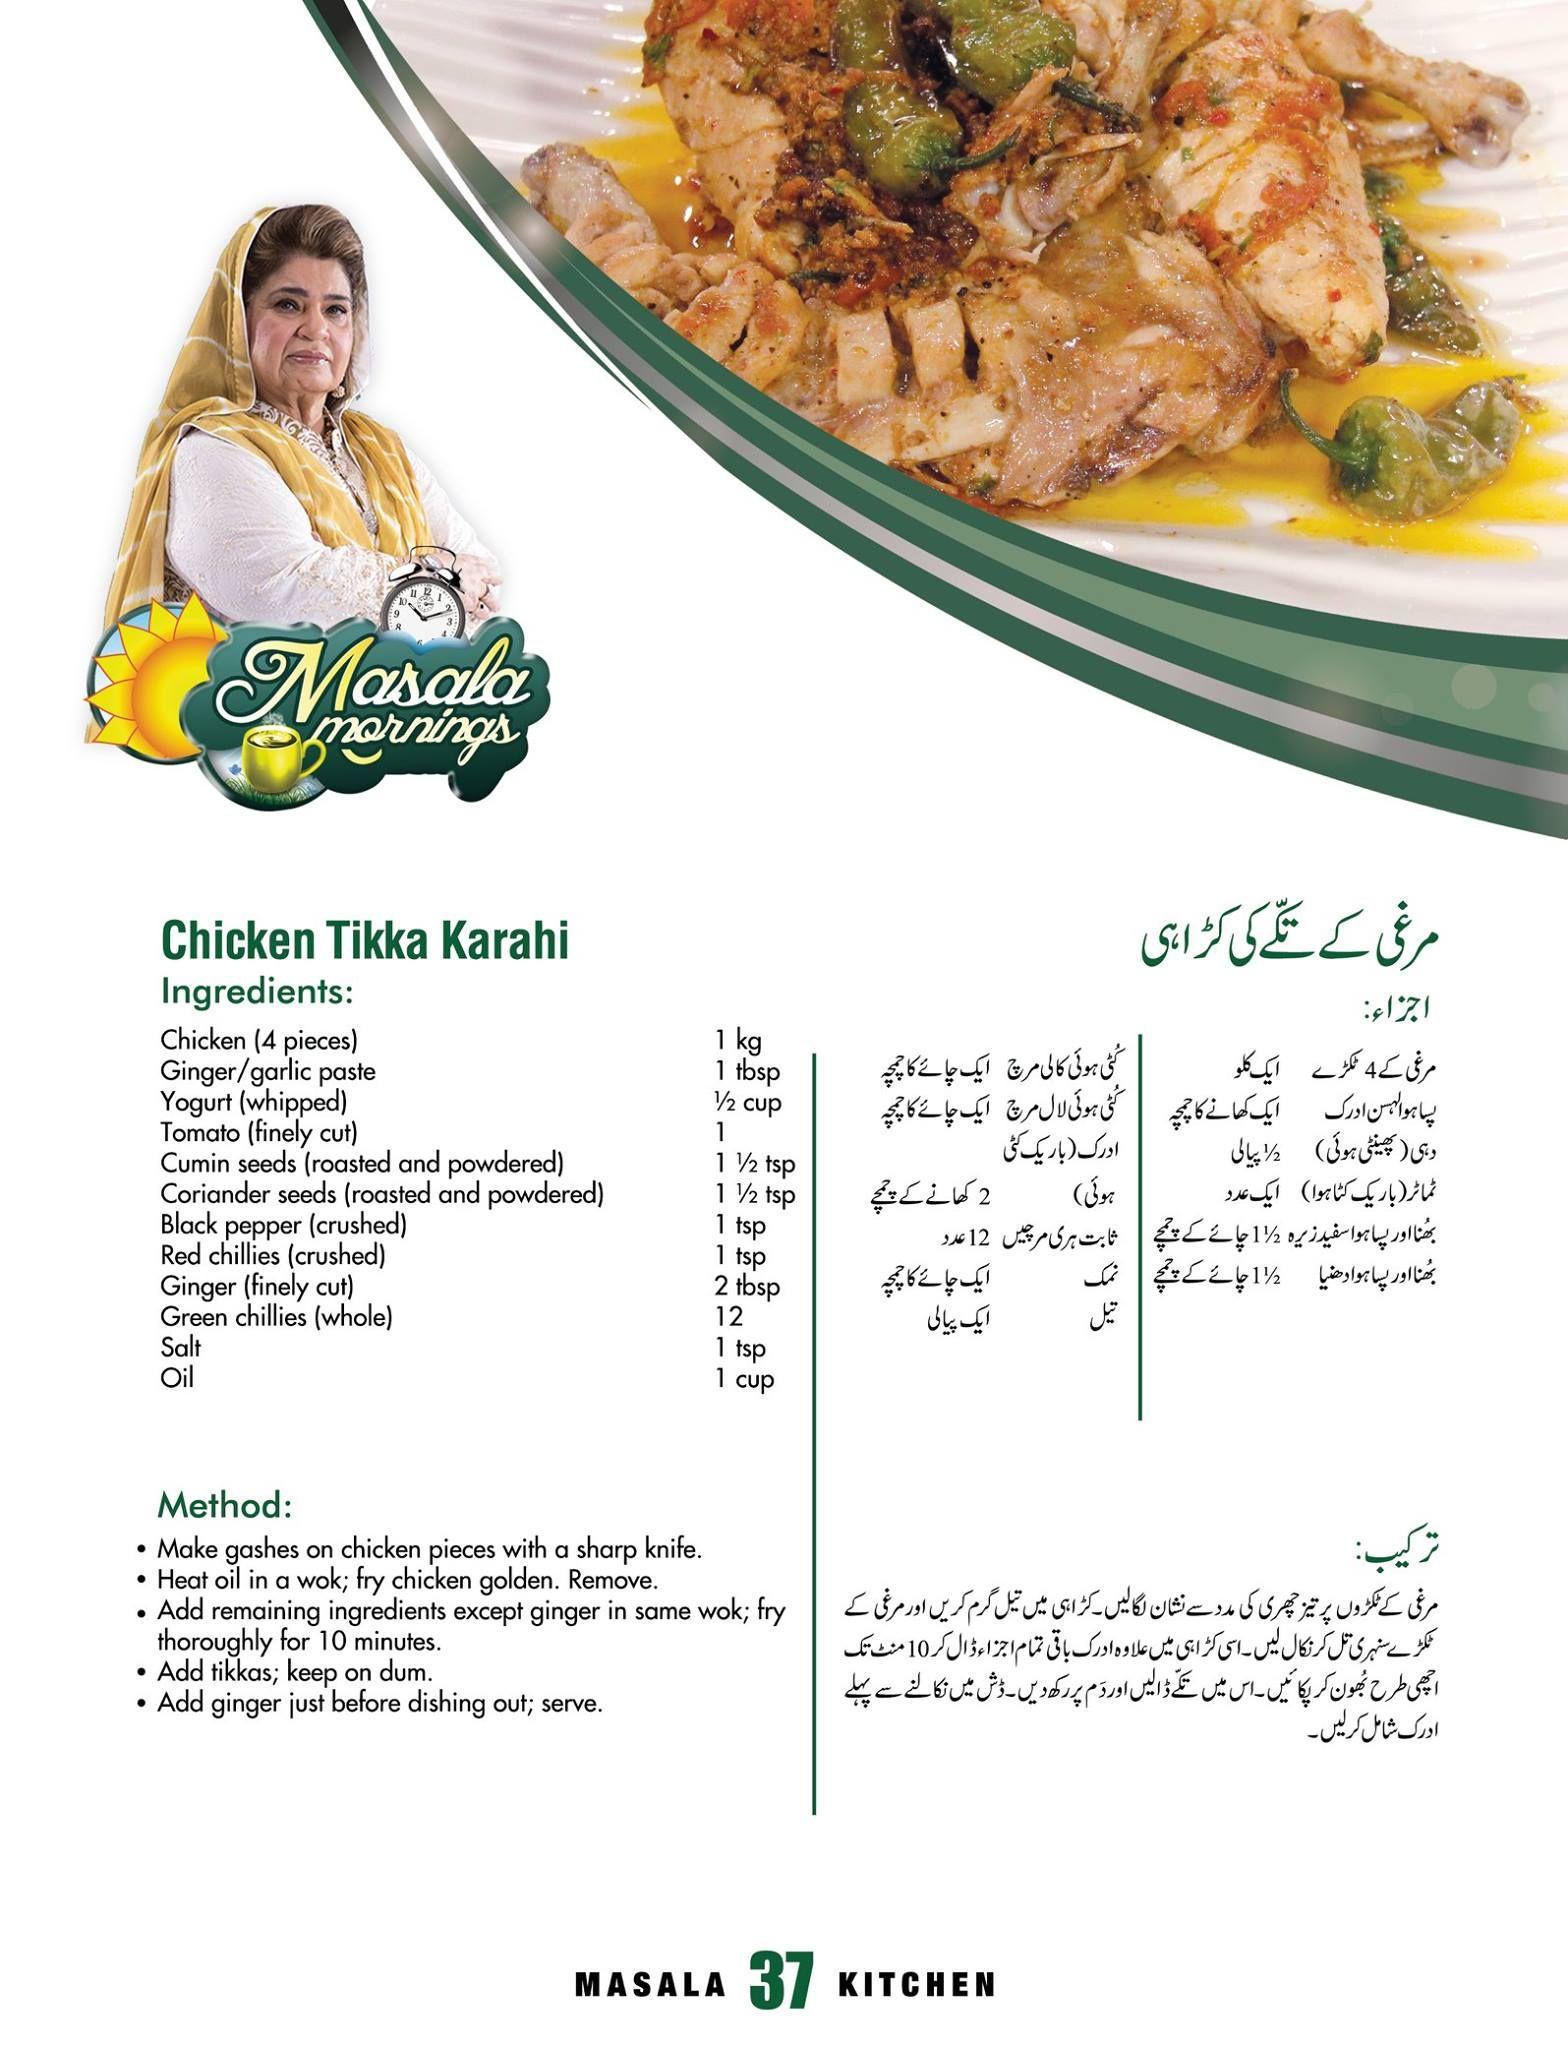 Karachi urdu recipe pinterest pakistani recipes desi food and karachi pakistani dishespakistani recipeschicken forumfinder Image collections